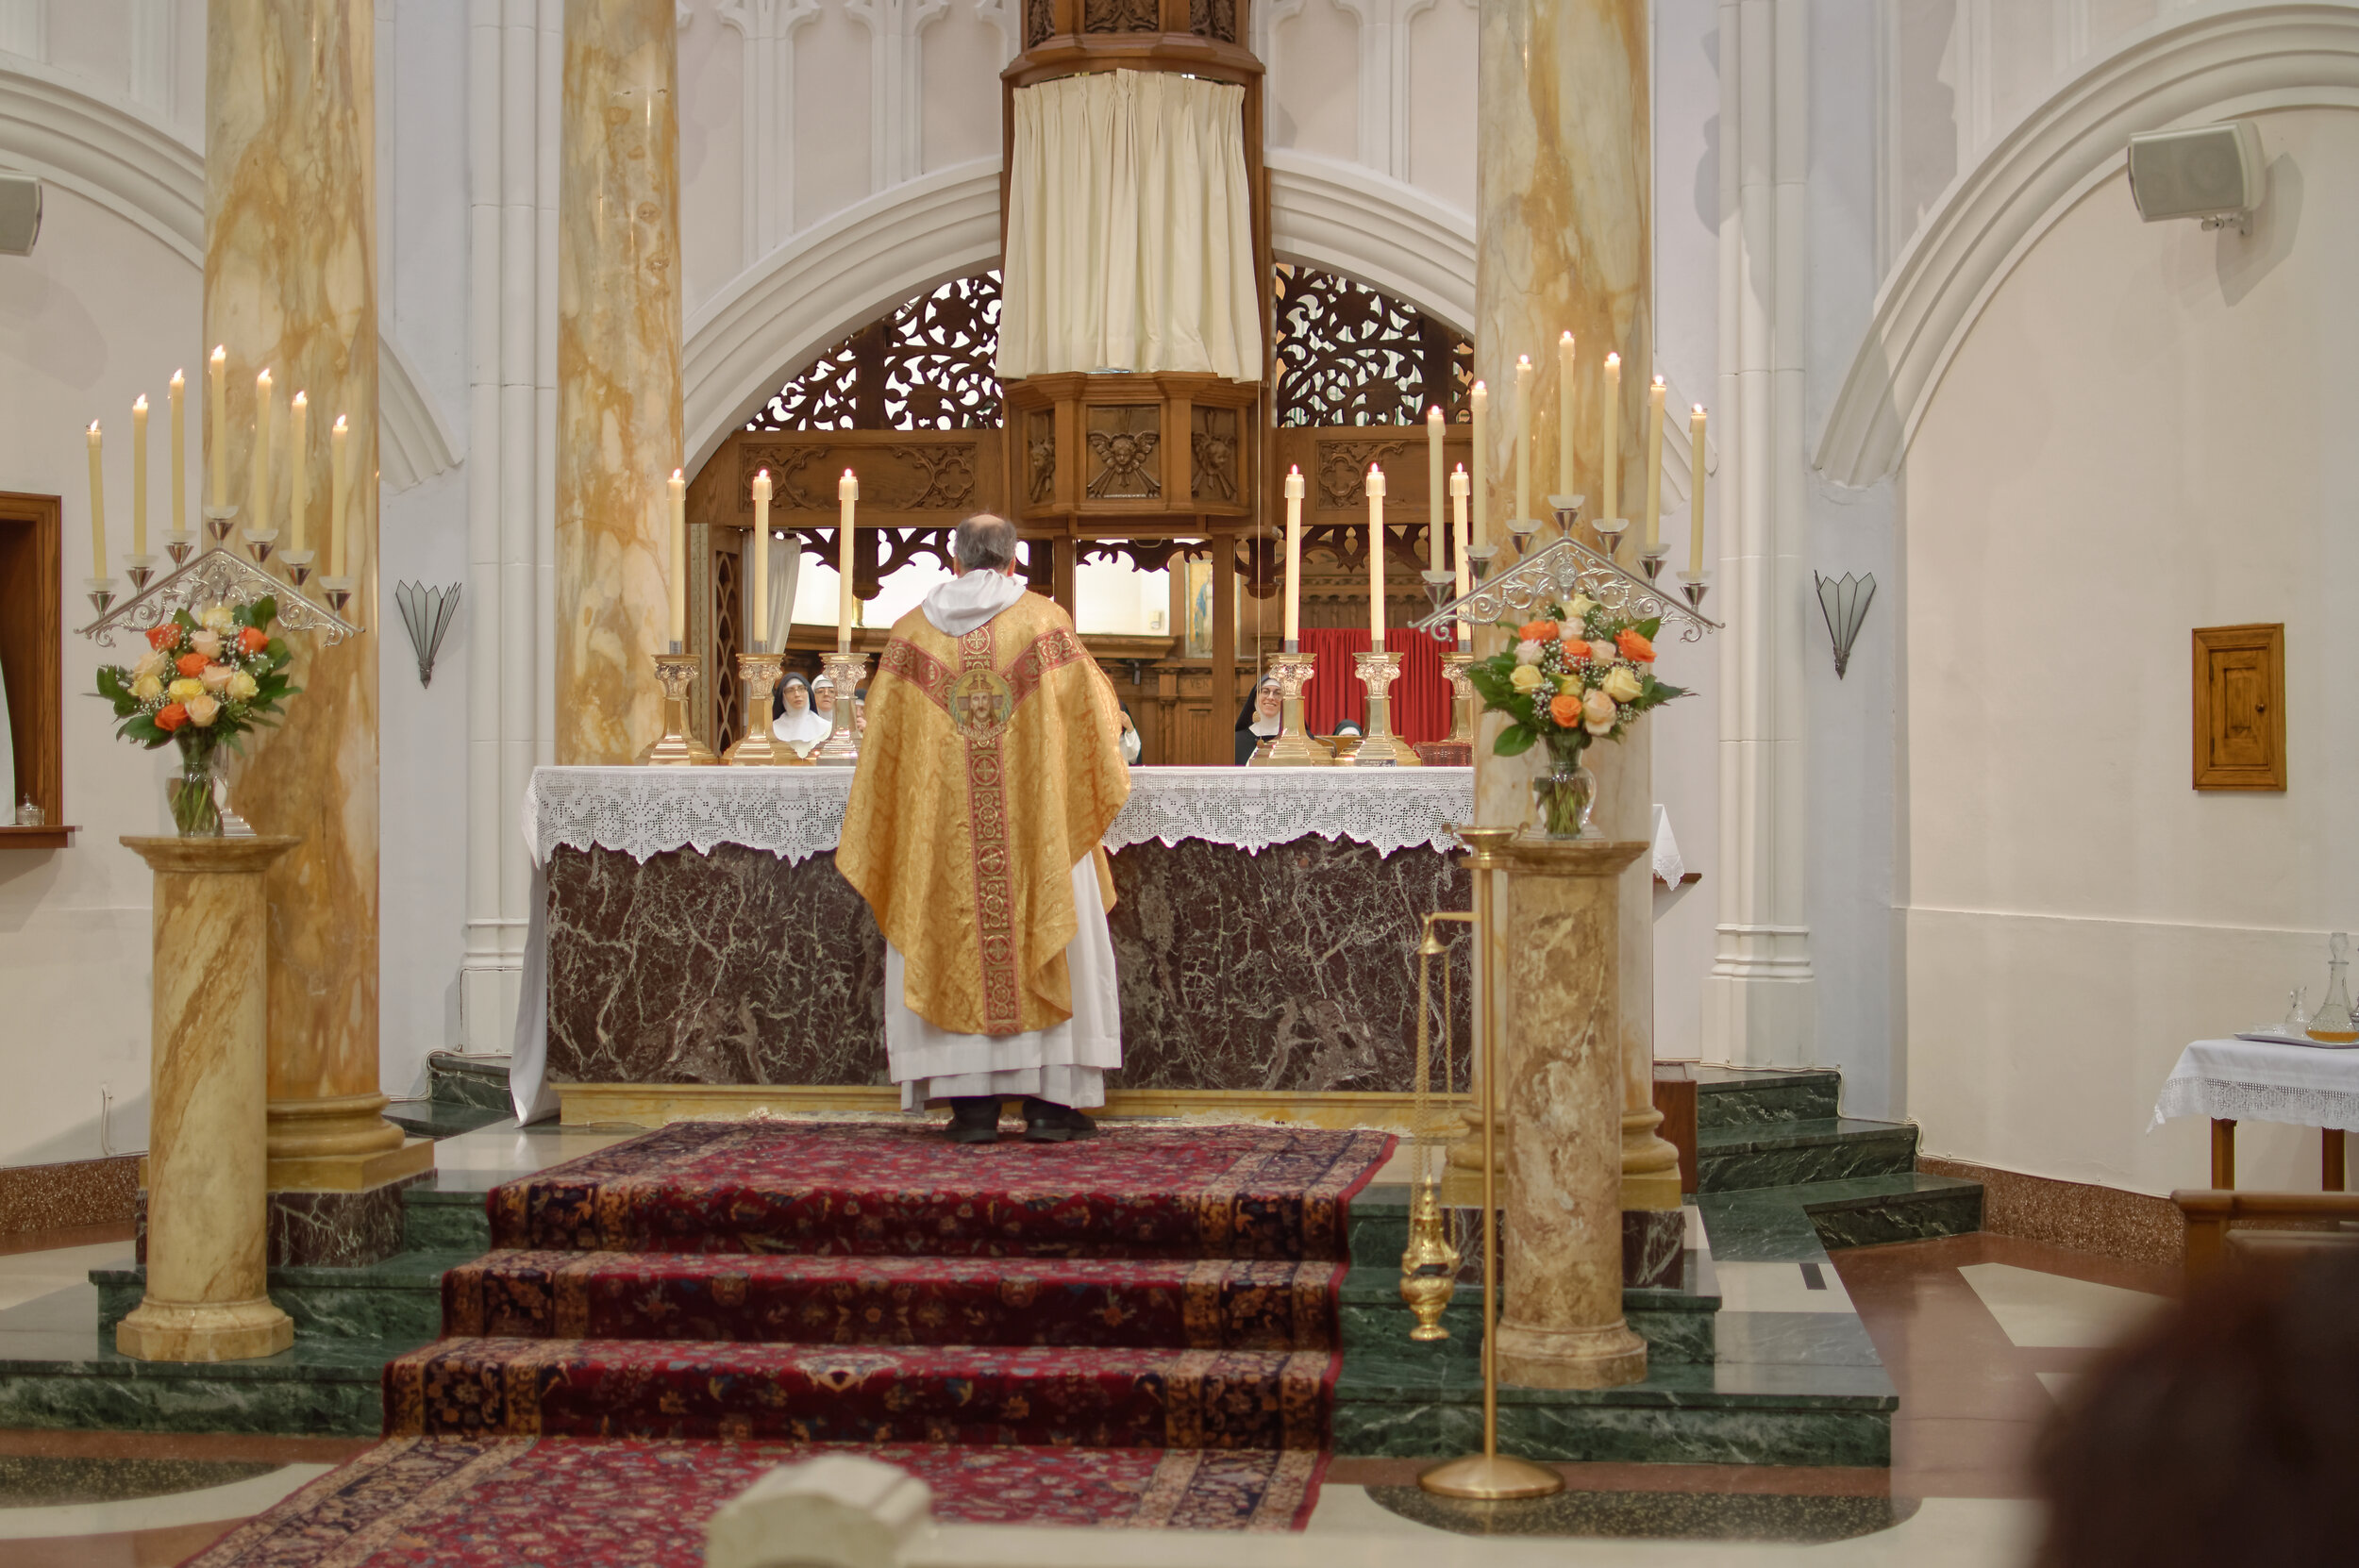 7:30 AM-Holy Sacrifice of the Mass